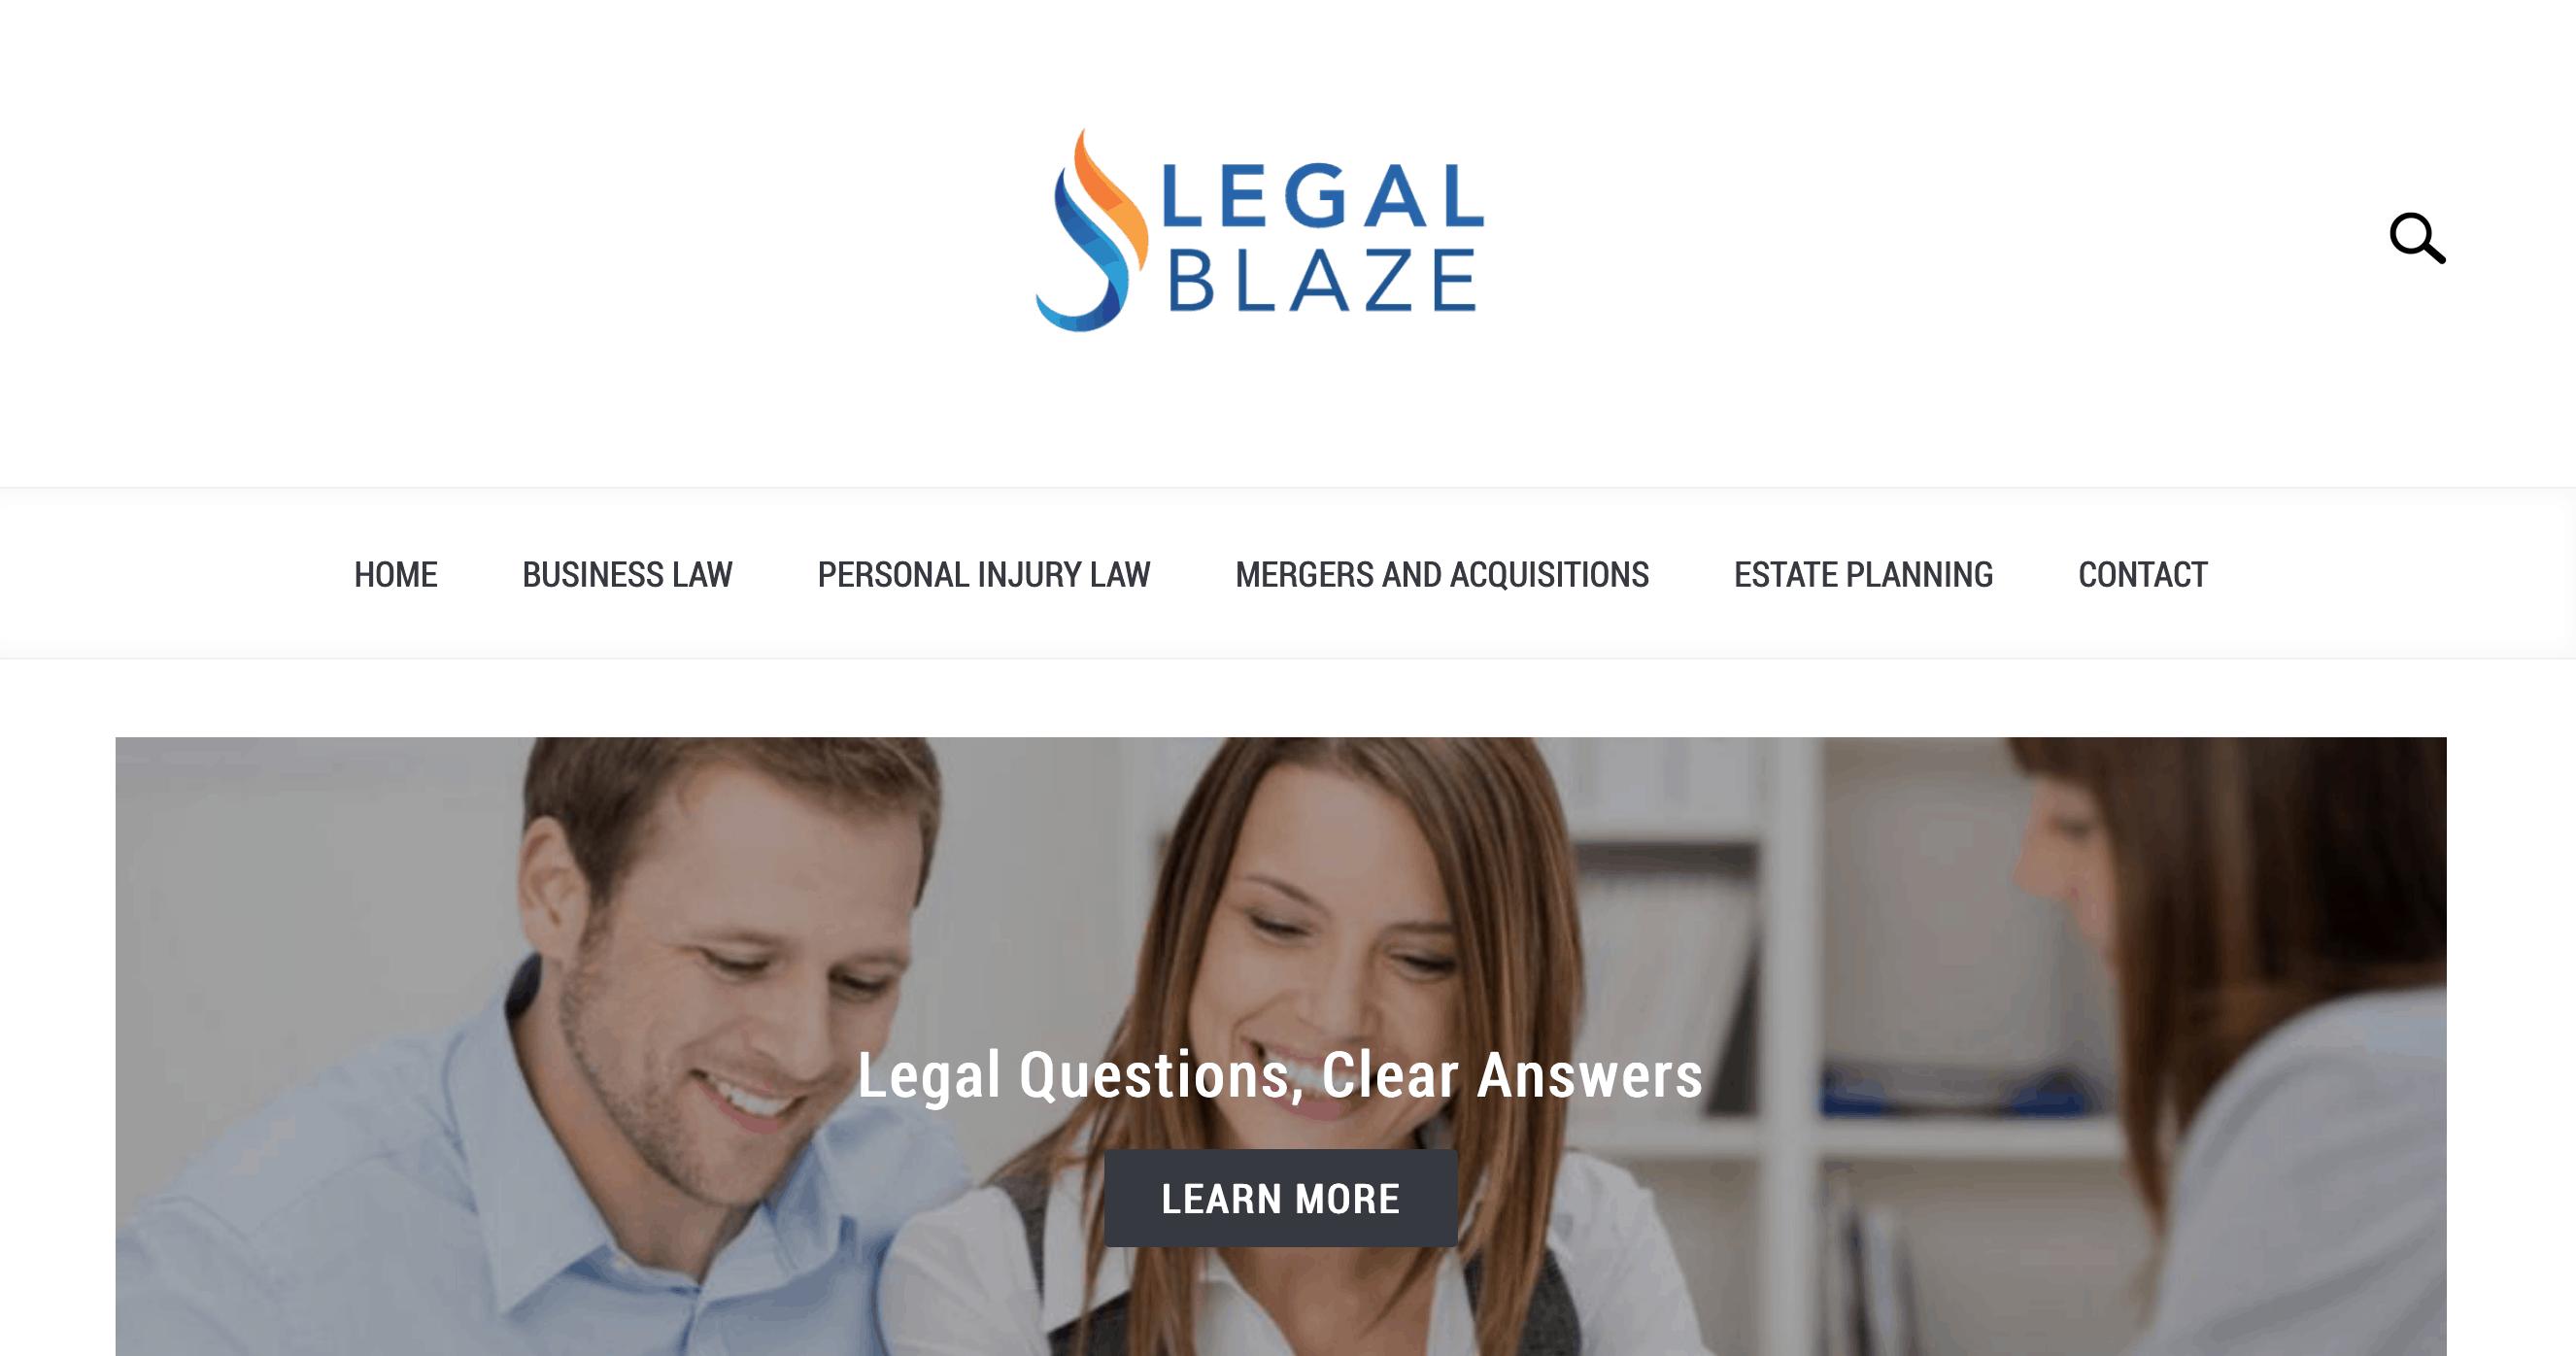 legal-blaze-home-page